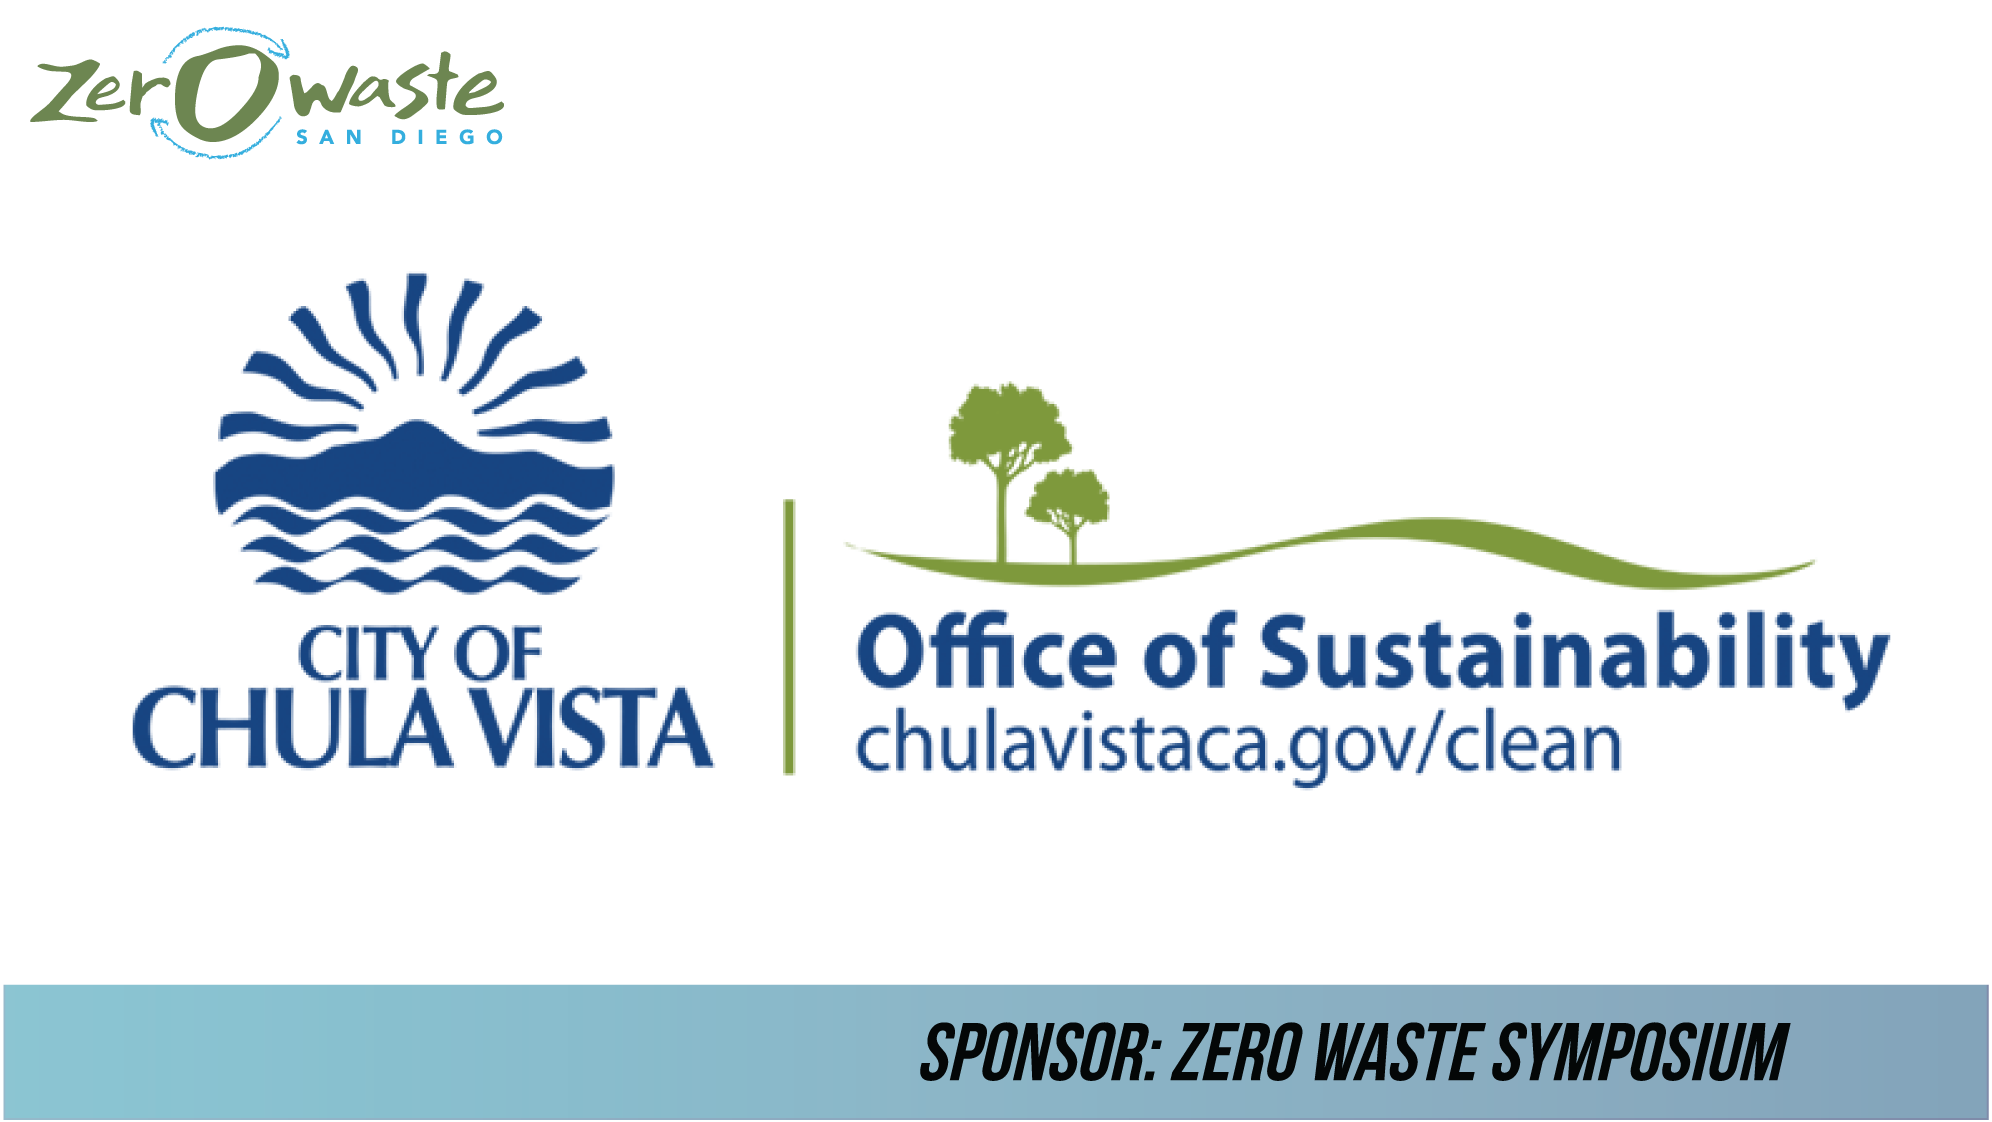 City of Chula Vista Office of Sustainability